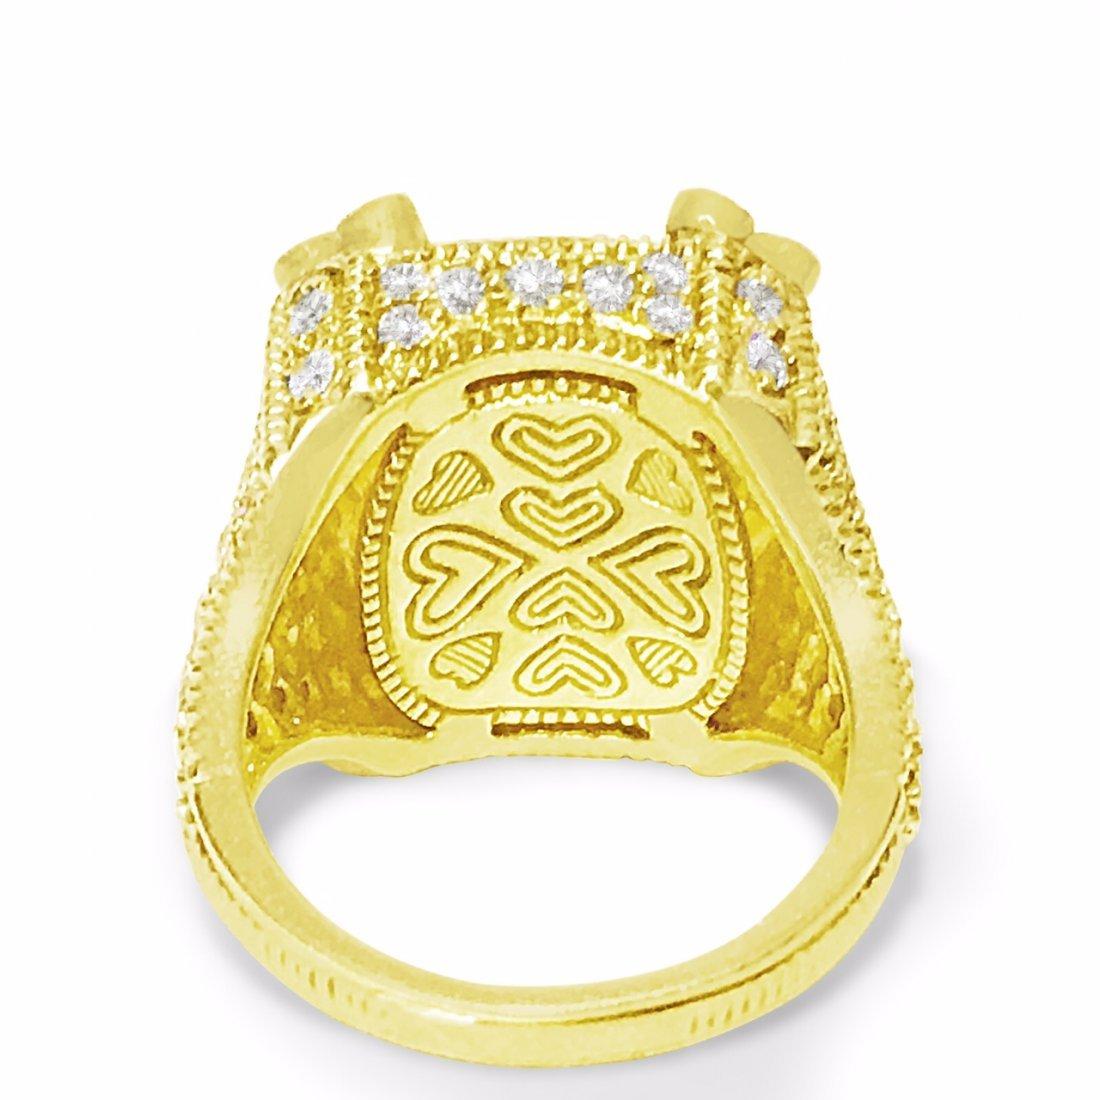 Judith Ripka 18K Gold Natural Diamond Cocktail Ring - 4